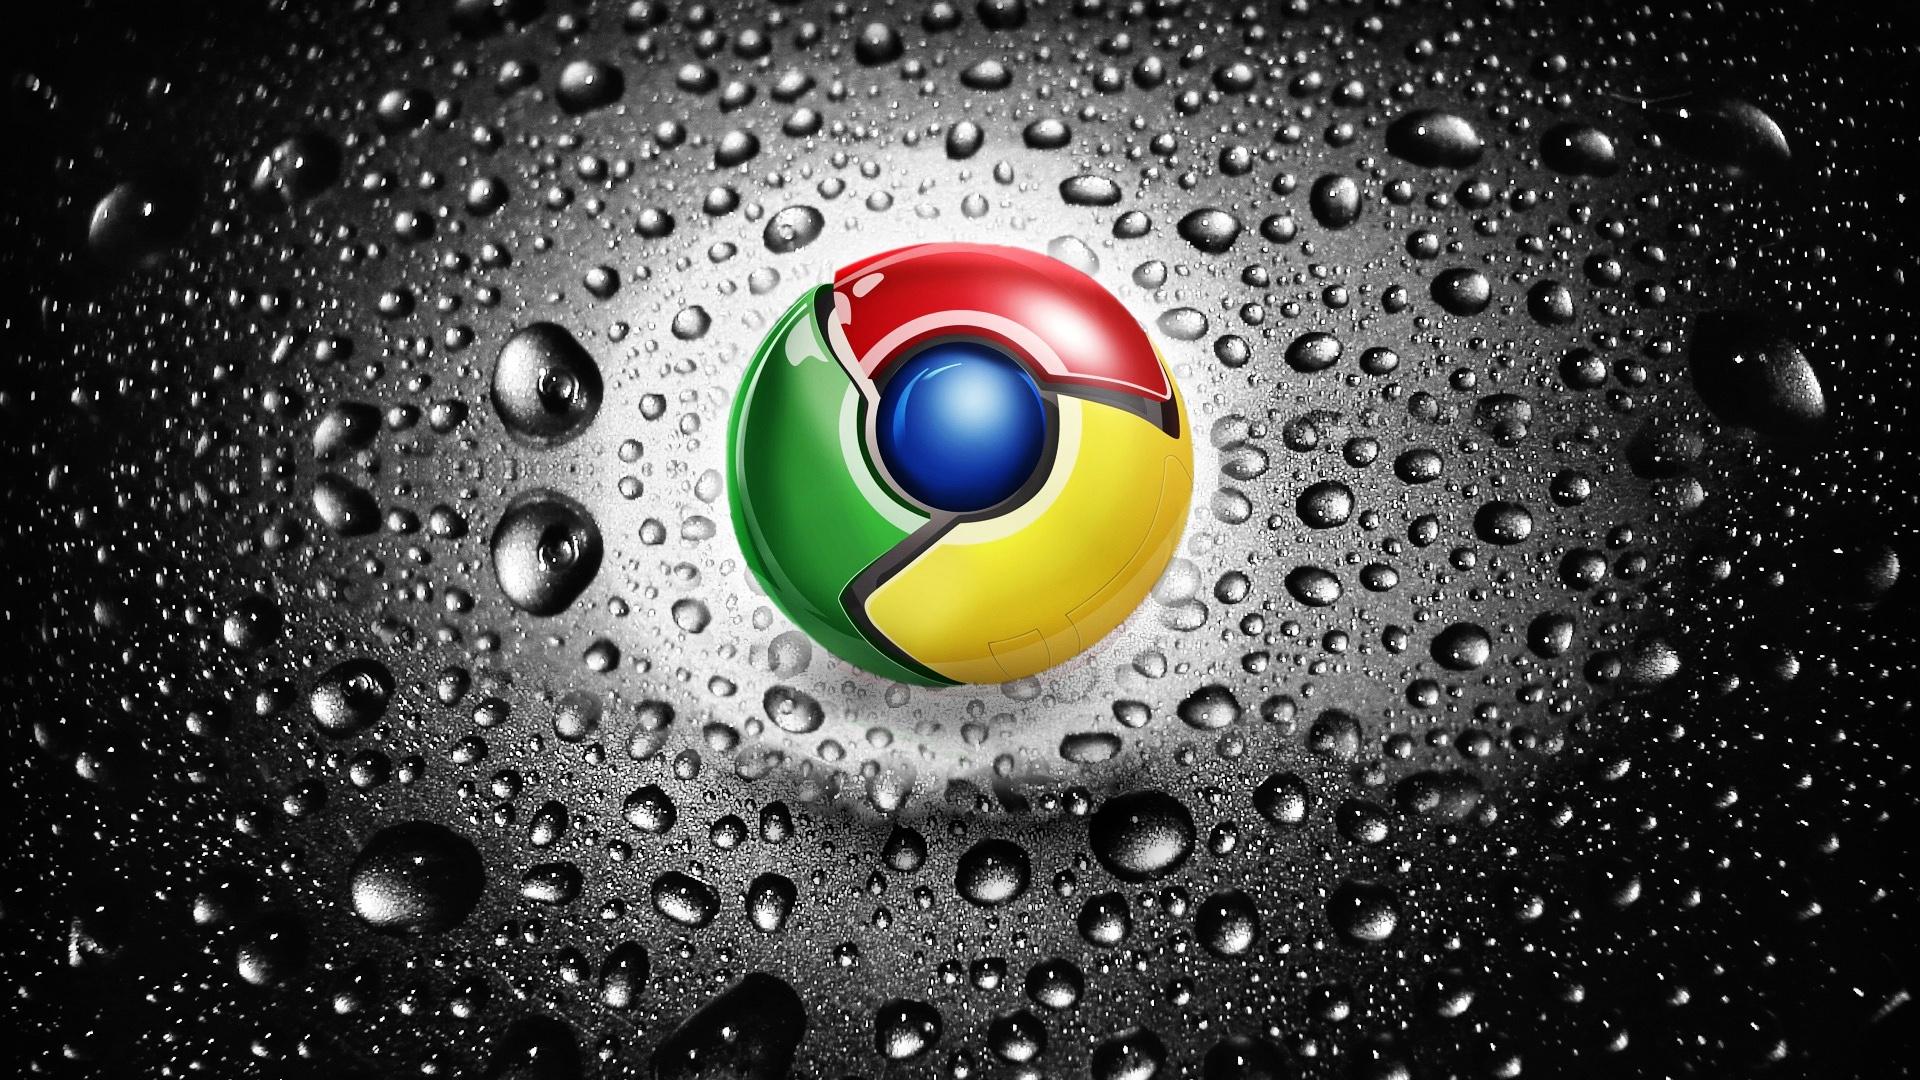 google wallpaper themes HD